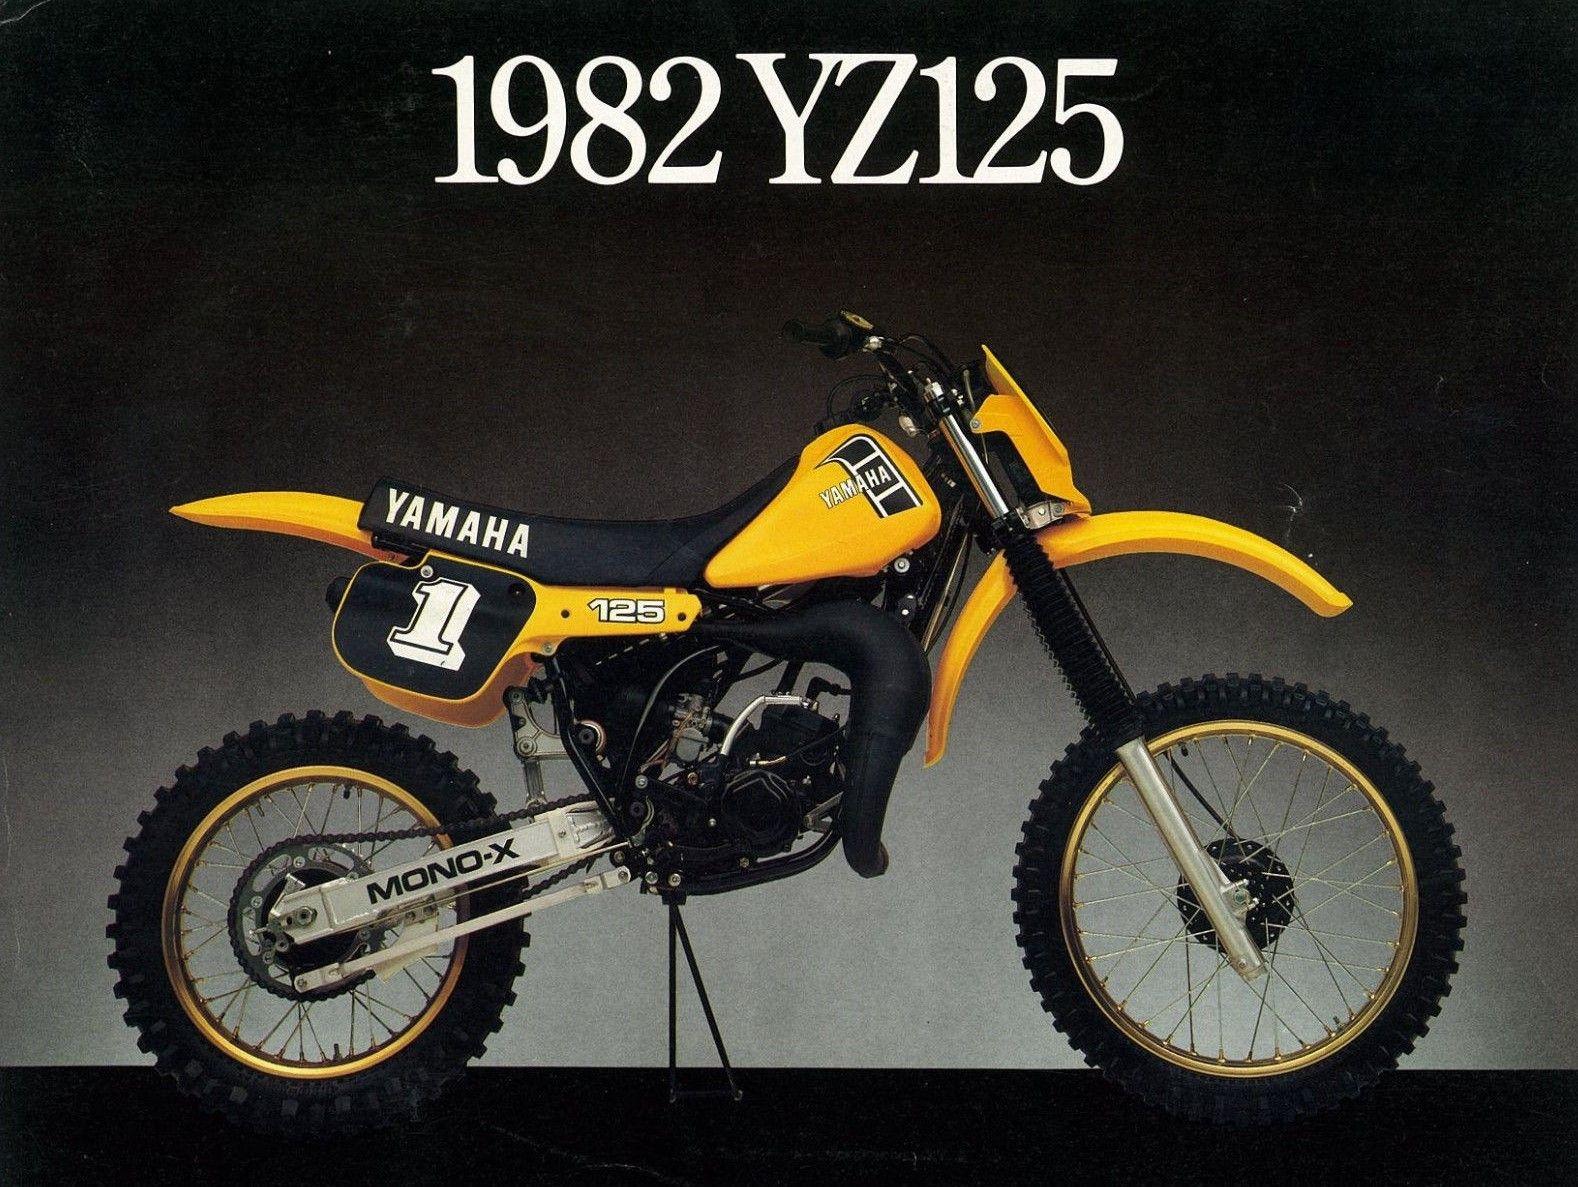 Yamaha yz 125 1982 usa